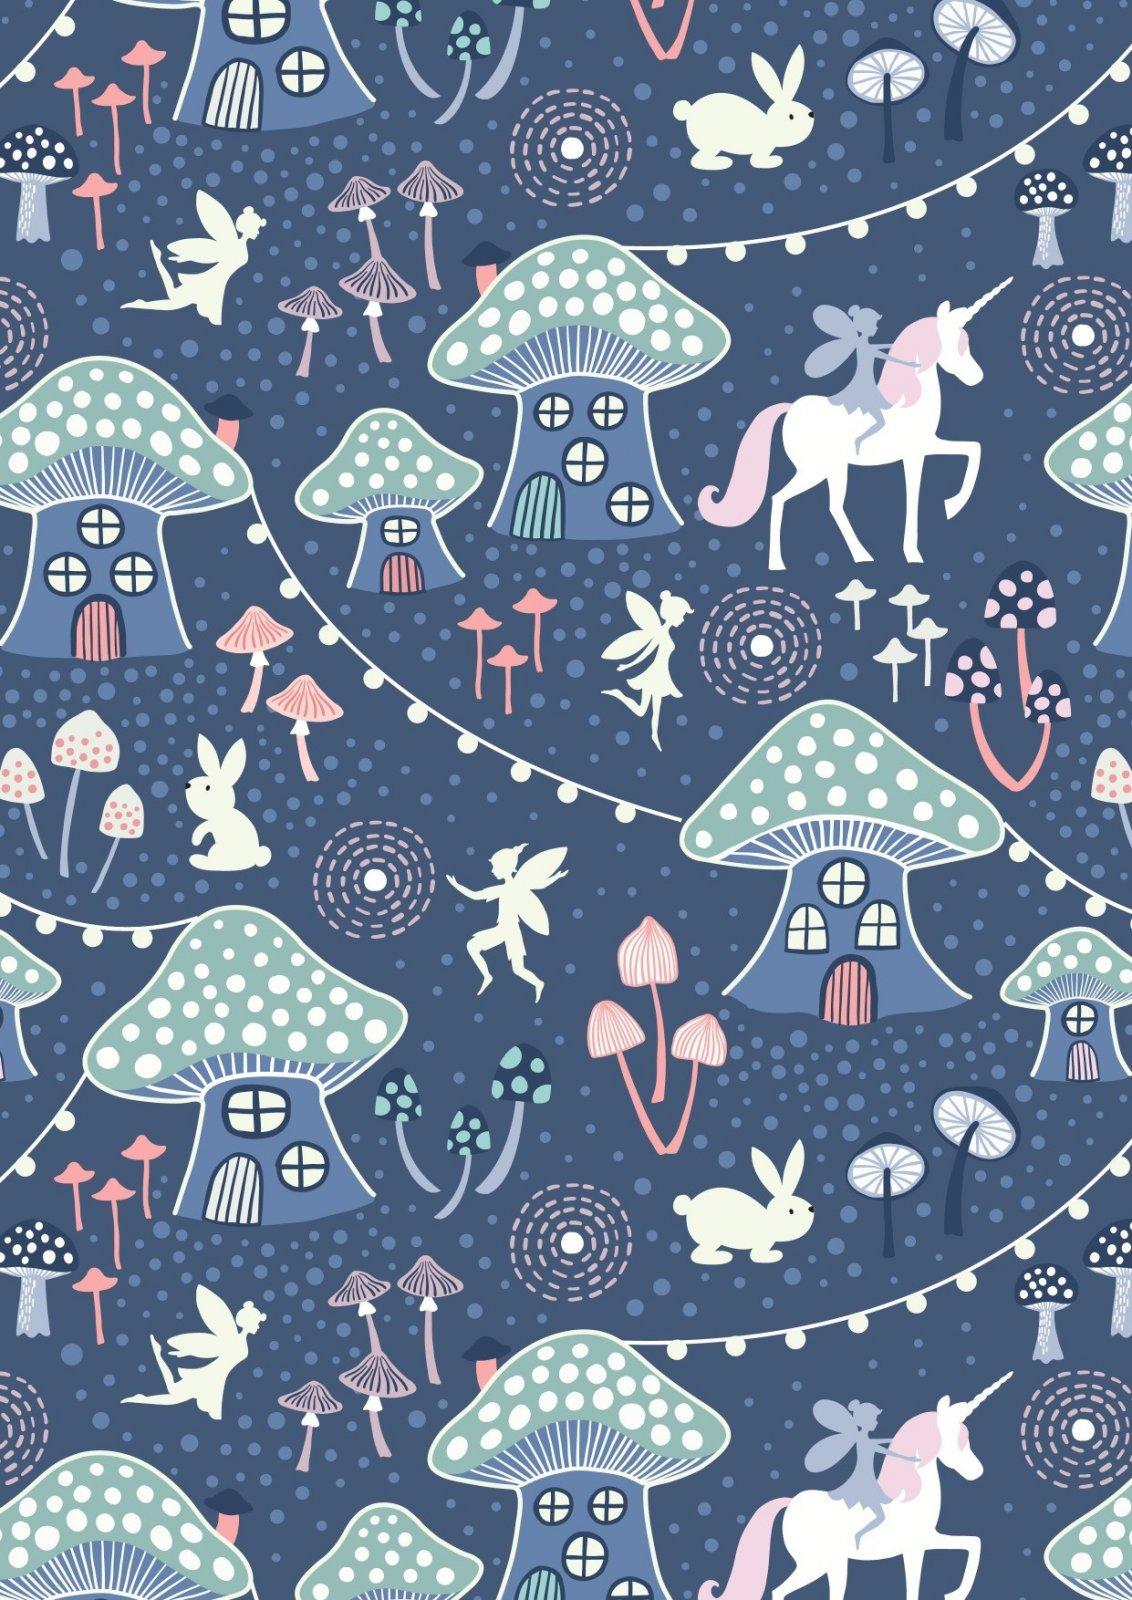 Mushroom Village on Midnight Blue